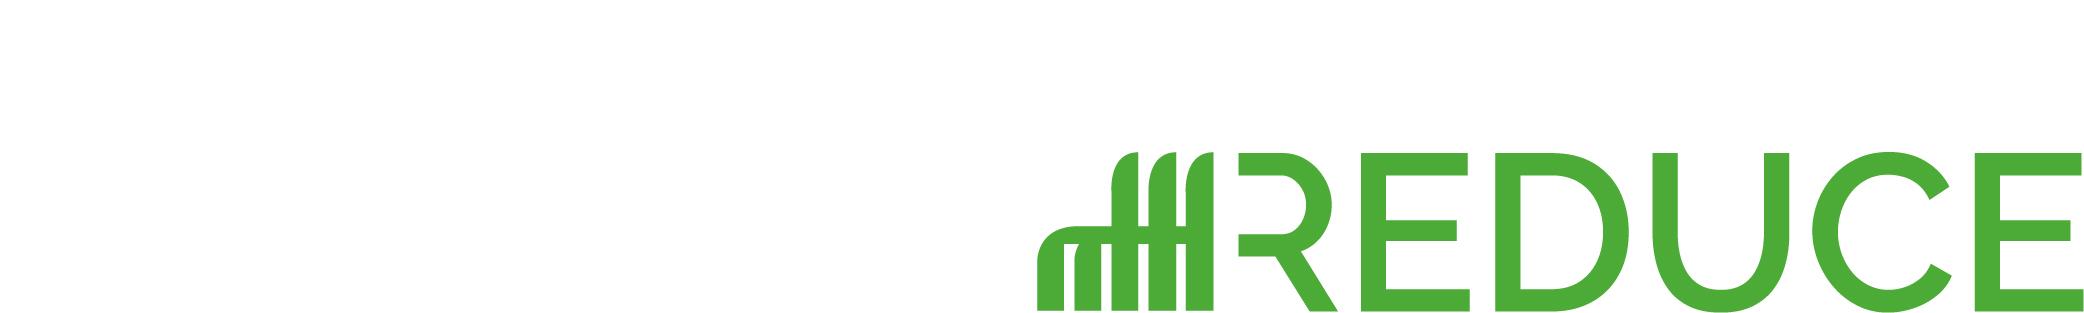 reduce, impegnogreen, greenpledge